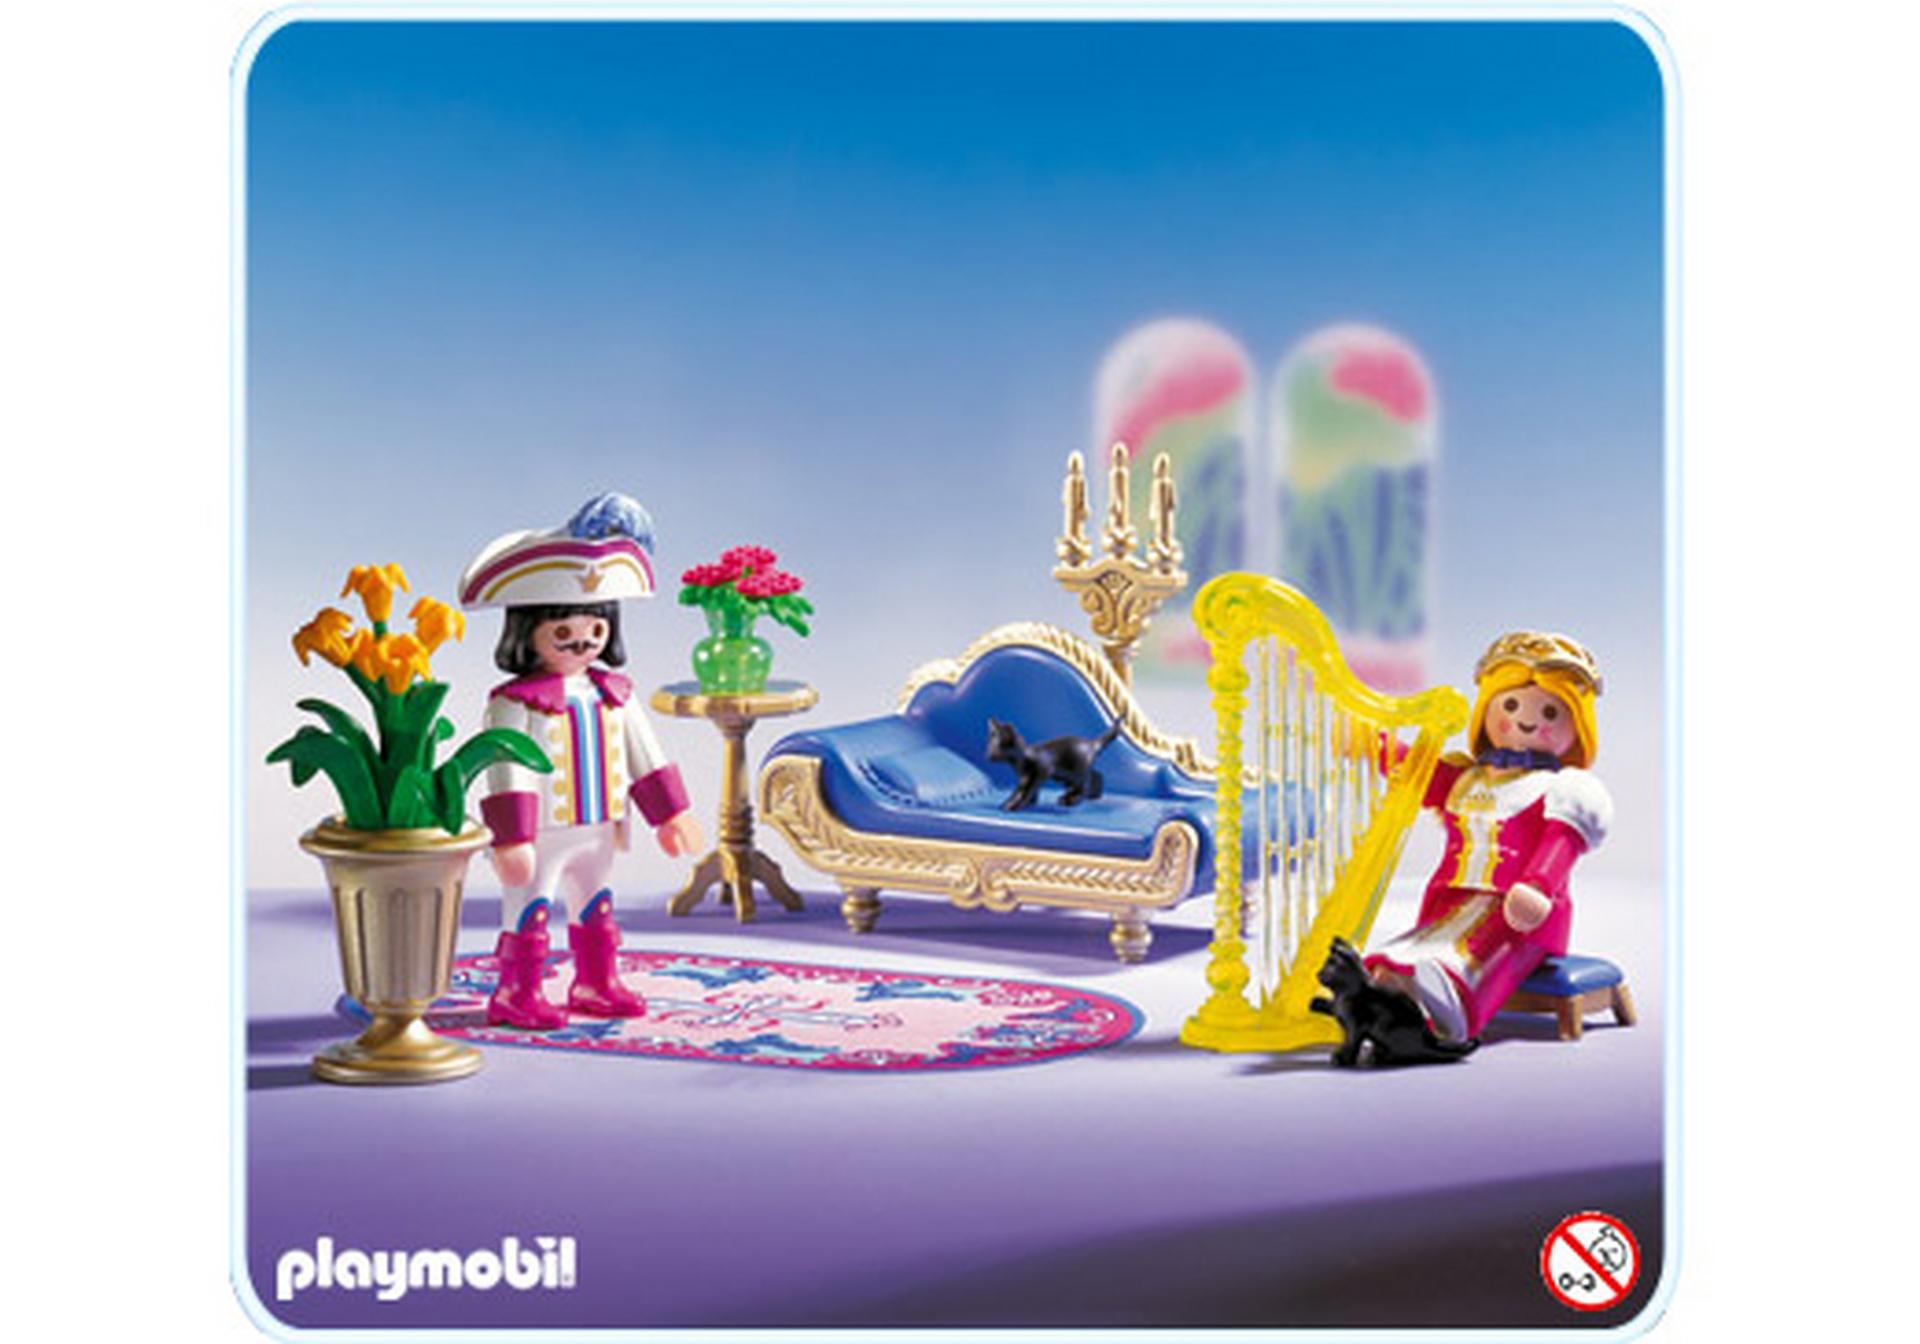 Salon royal 3022 a playmobil france for Salon playmobil